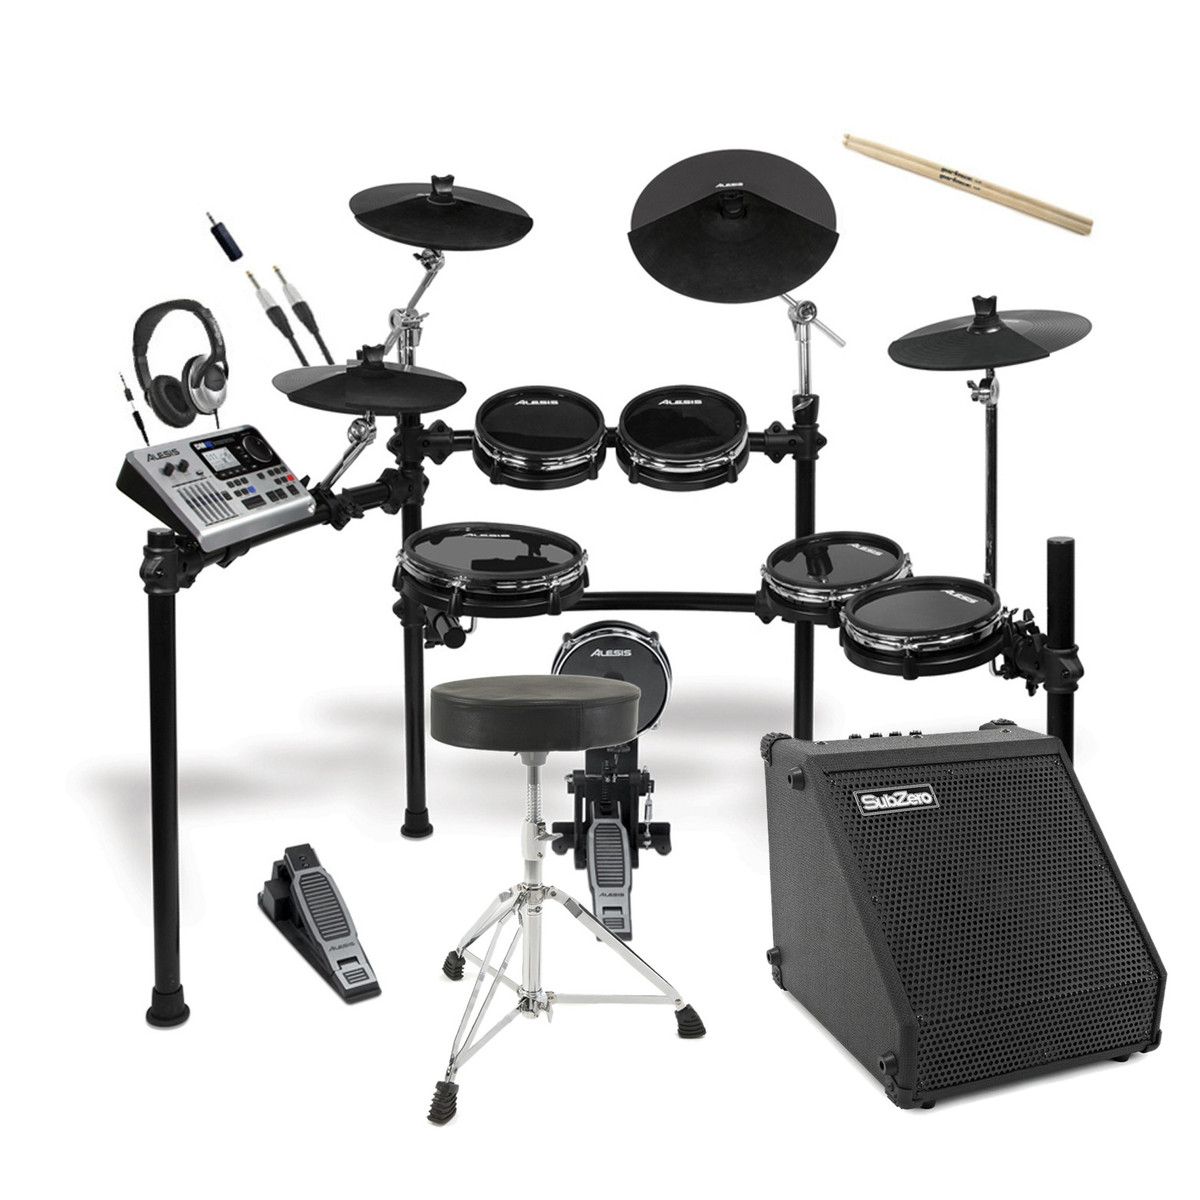 disc alesis dm10 x studio kit mesh digital drum kit bundle at gear4music